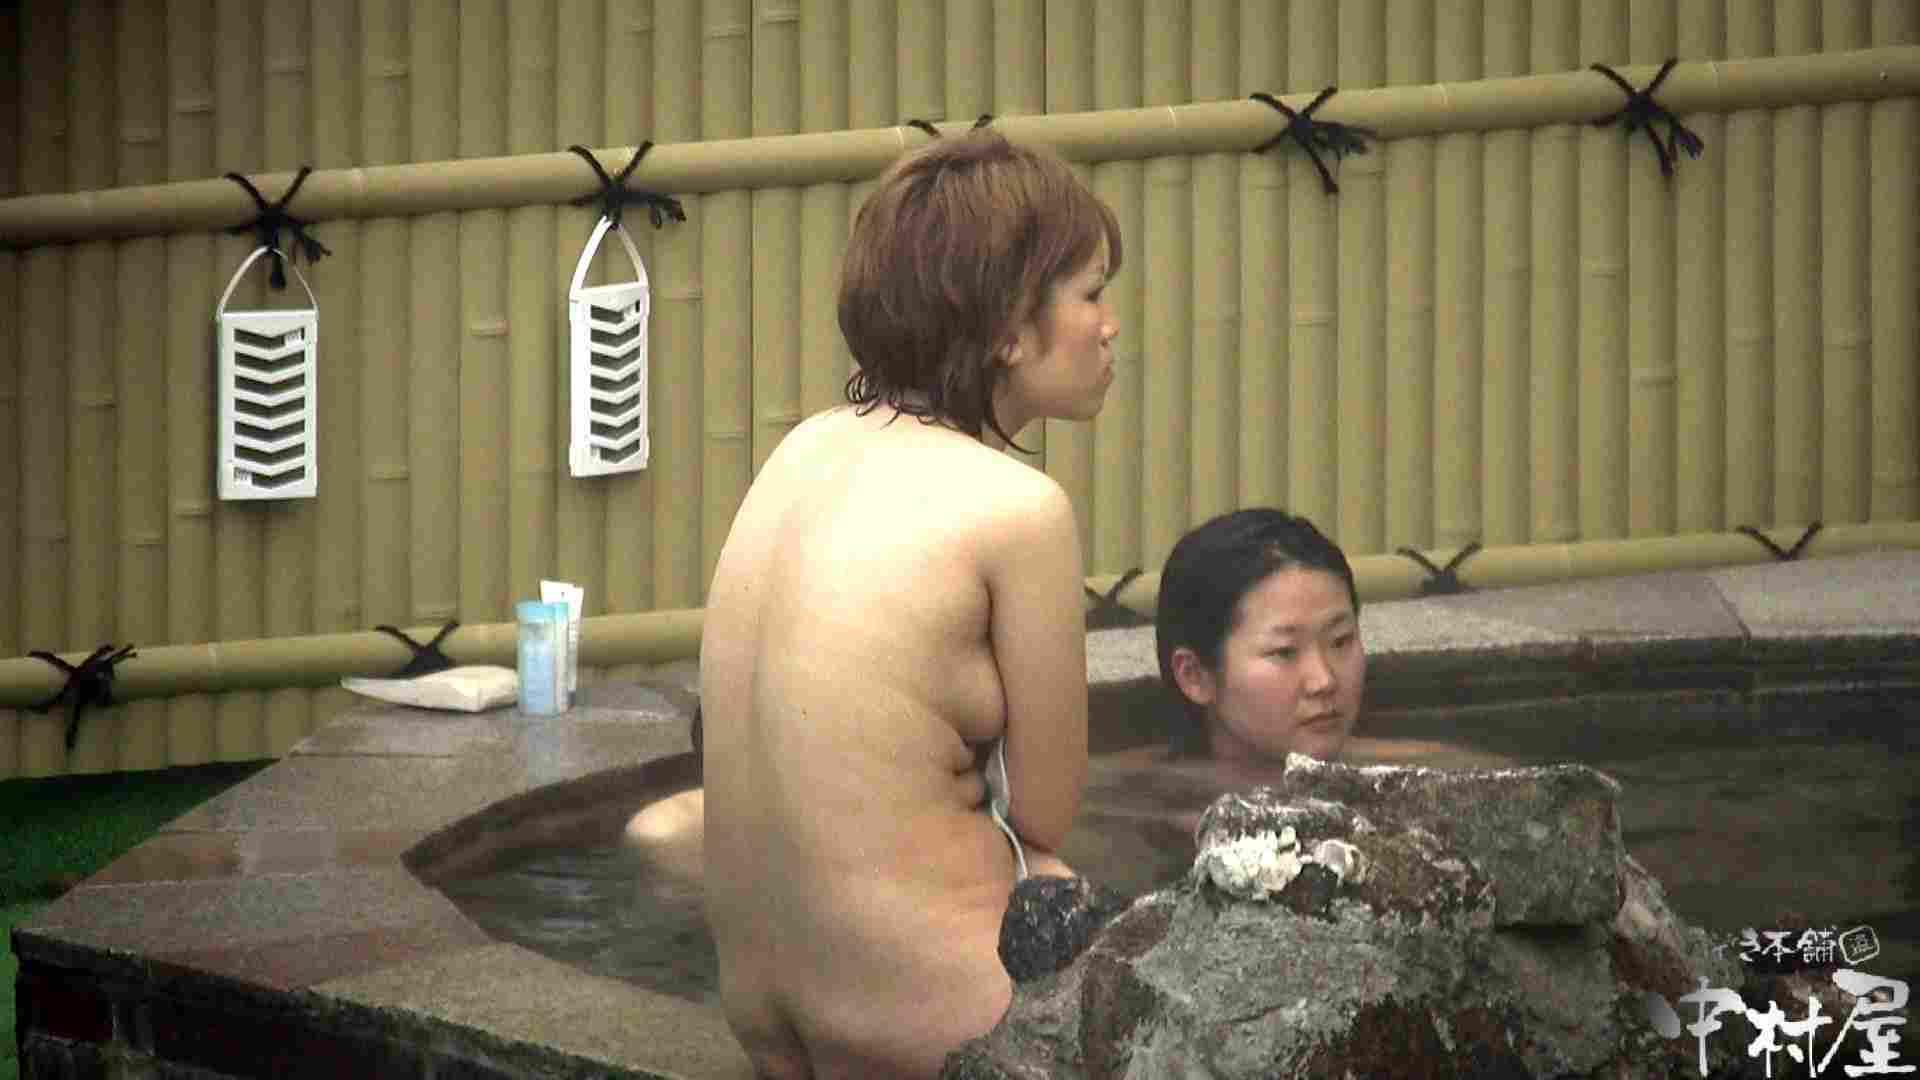 Aquaな露天風呂Vol.918 露天風呂突入 おまんこ無修正動画無料 75pic 44